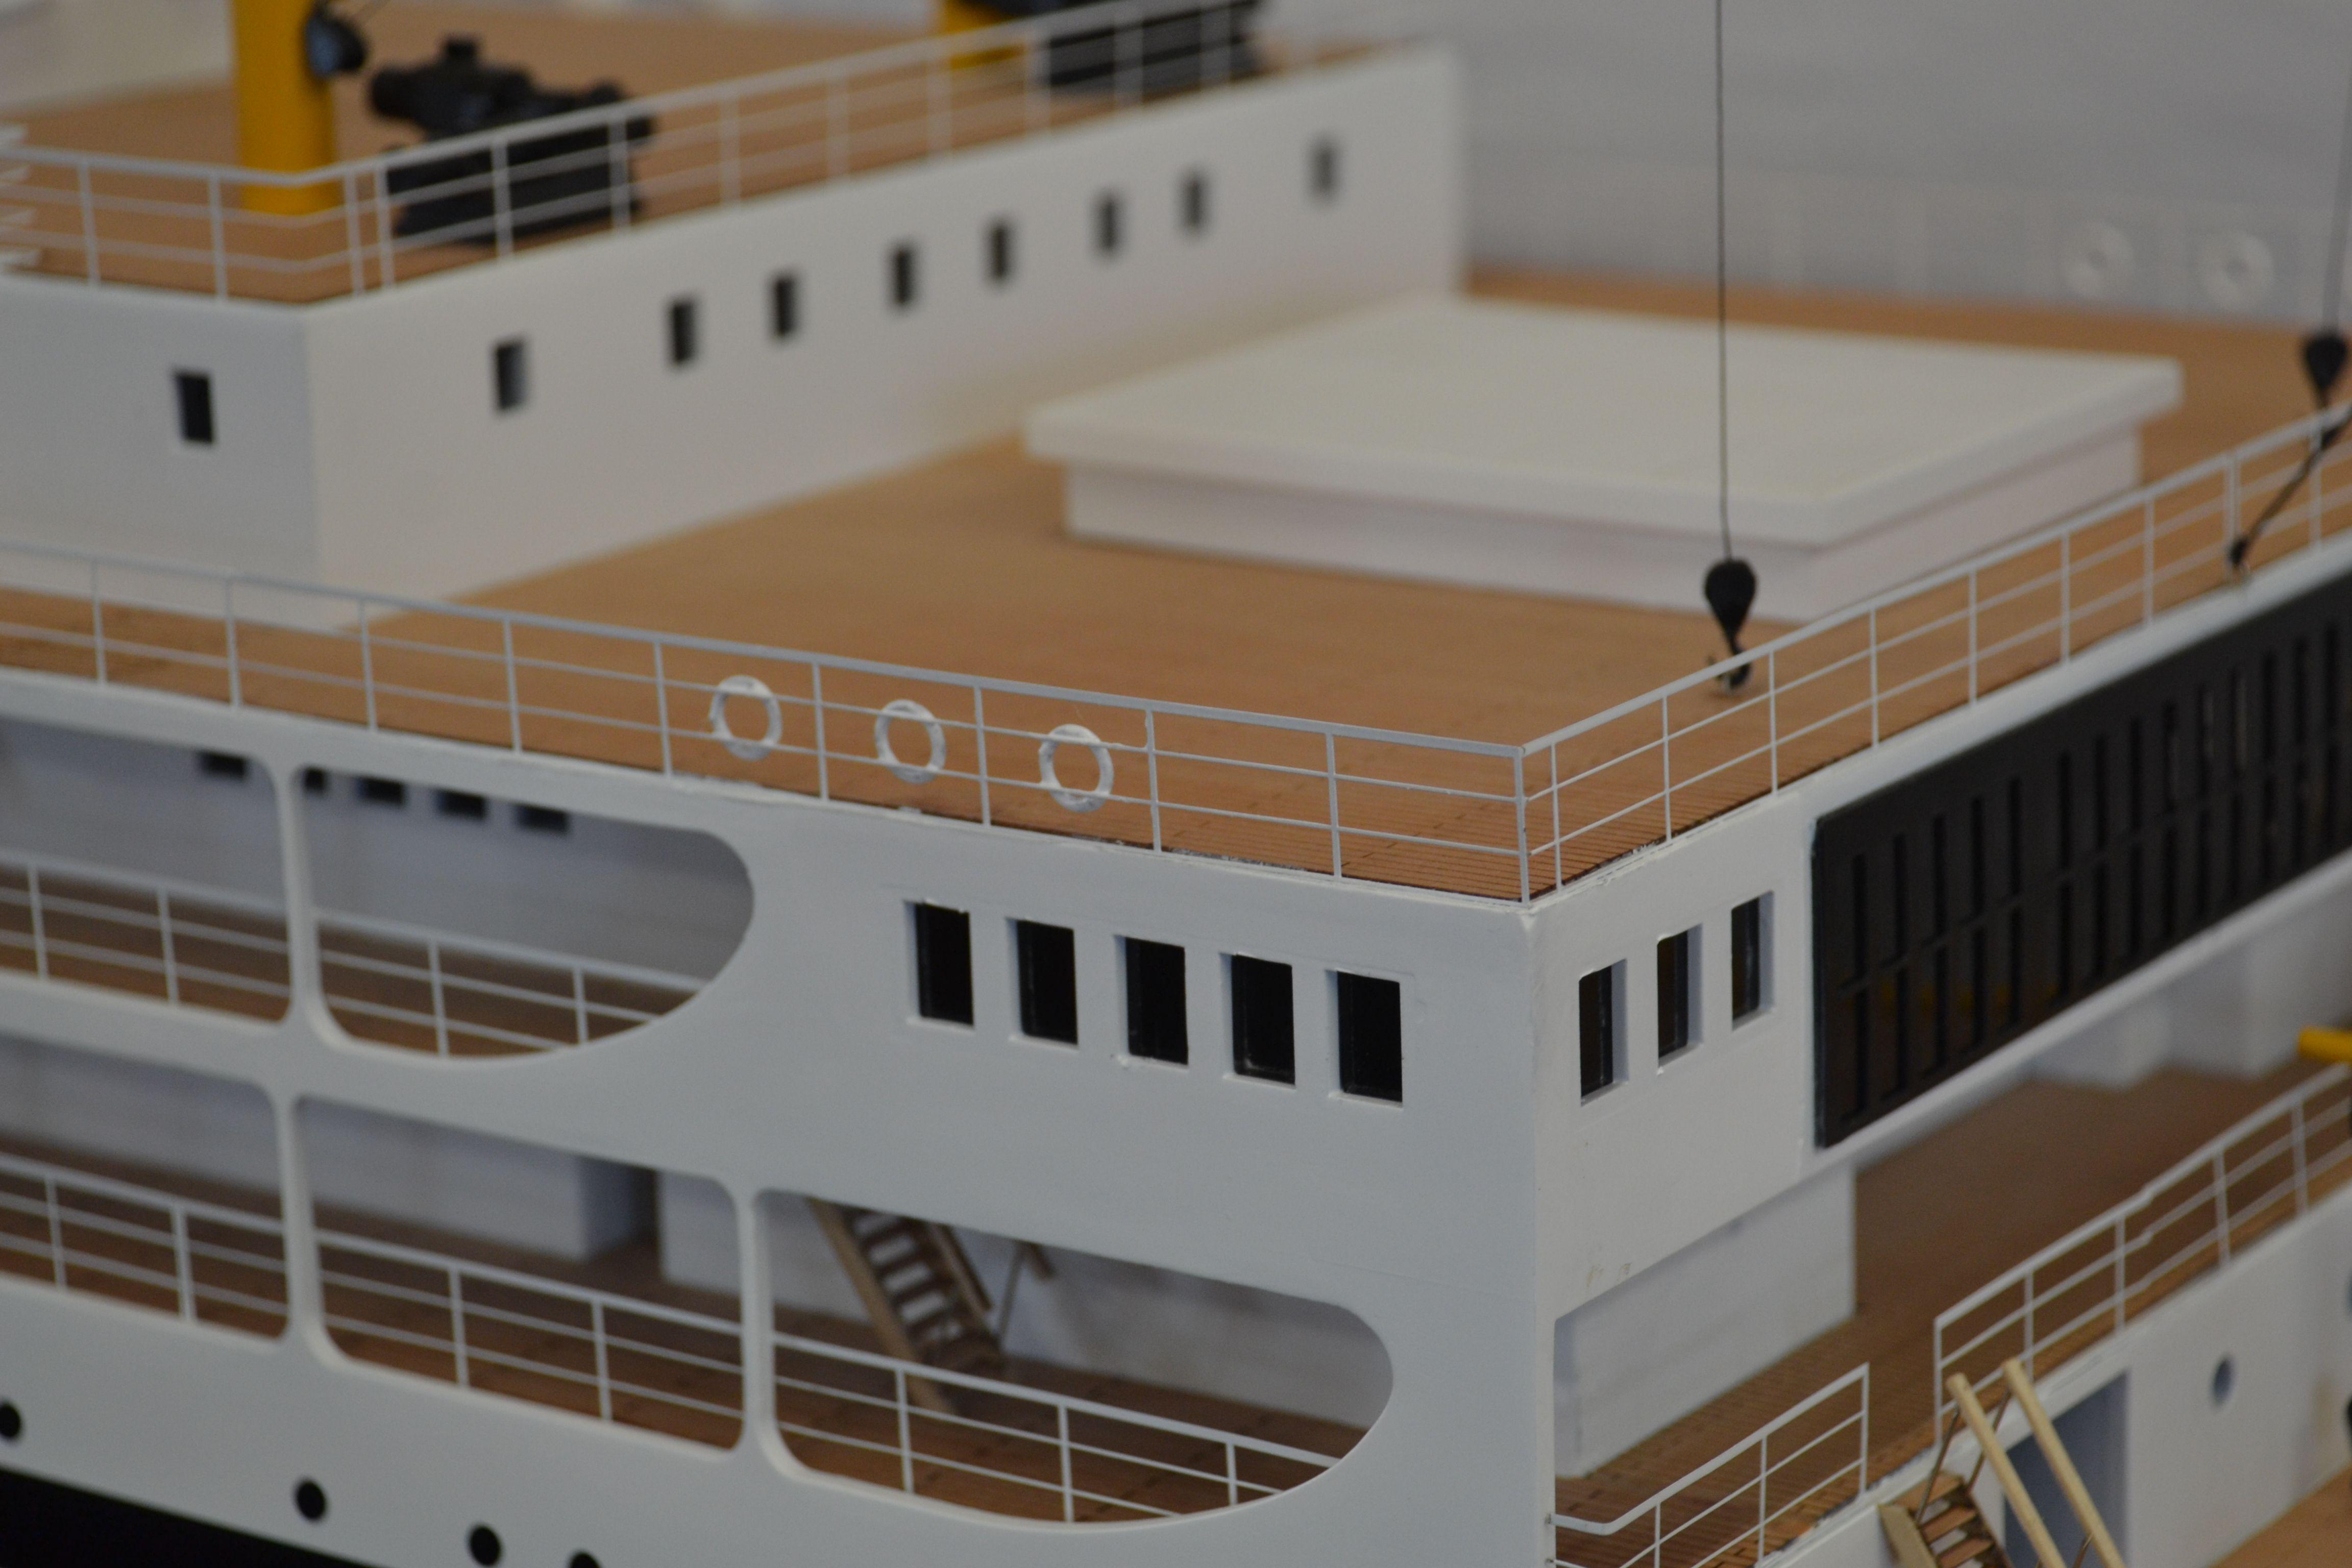 2209-12958-SS-Corinthic-Model-Ship